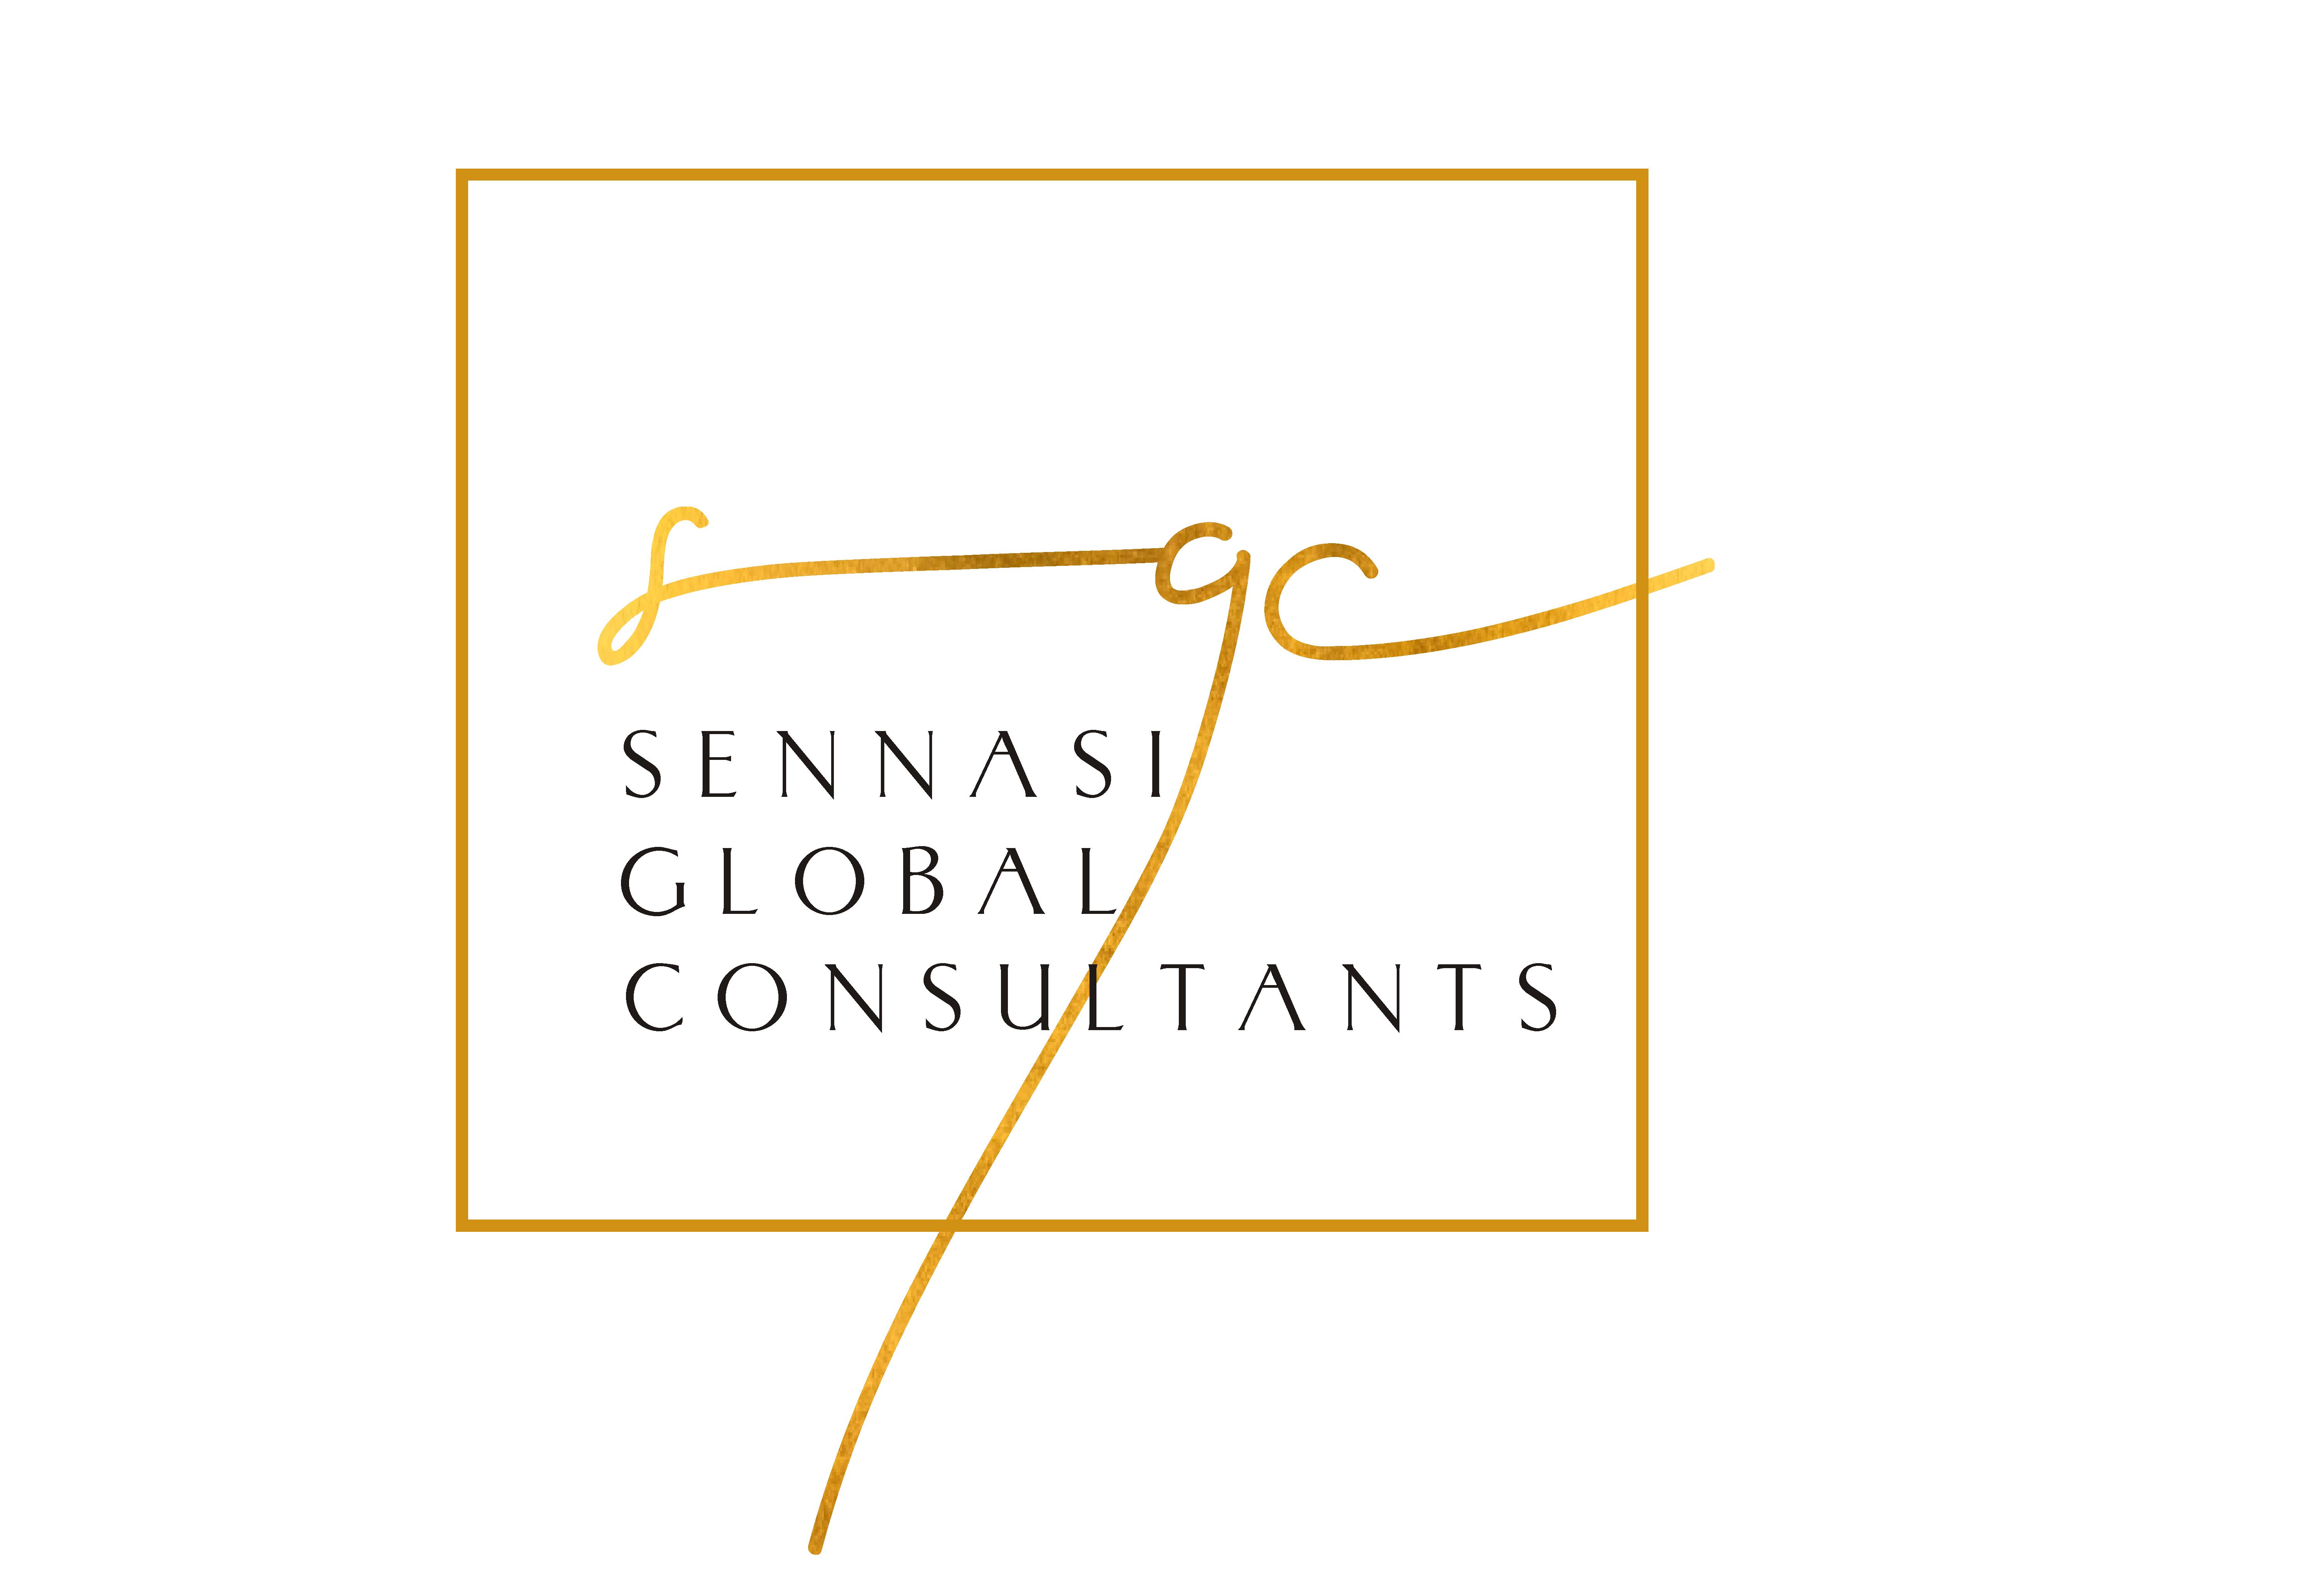 swennasi global consultants